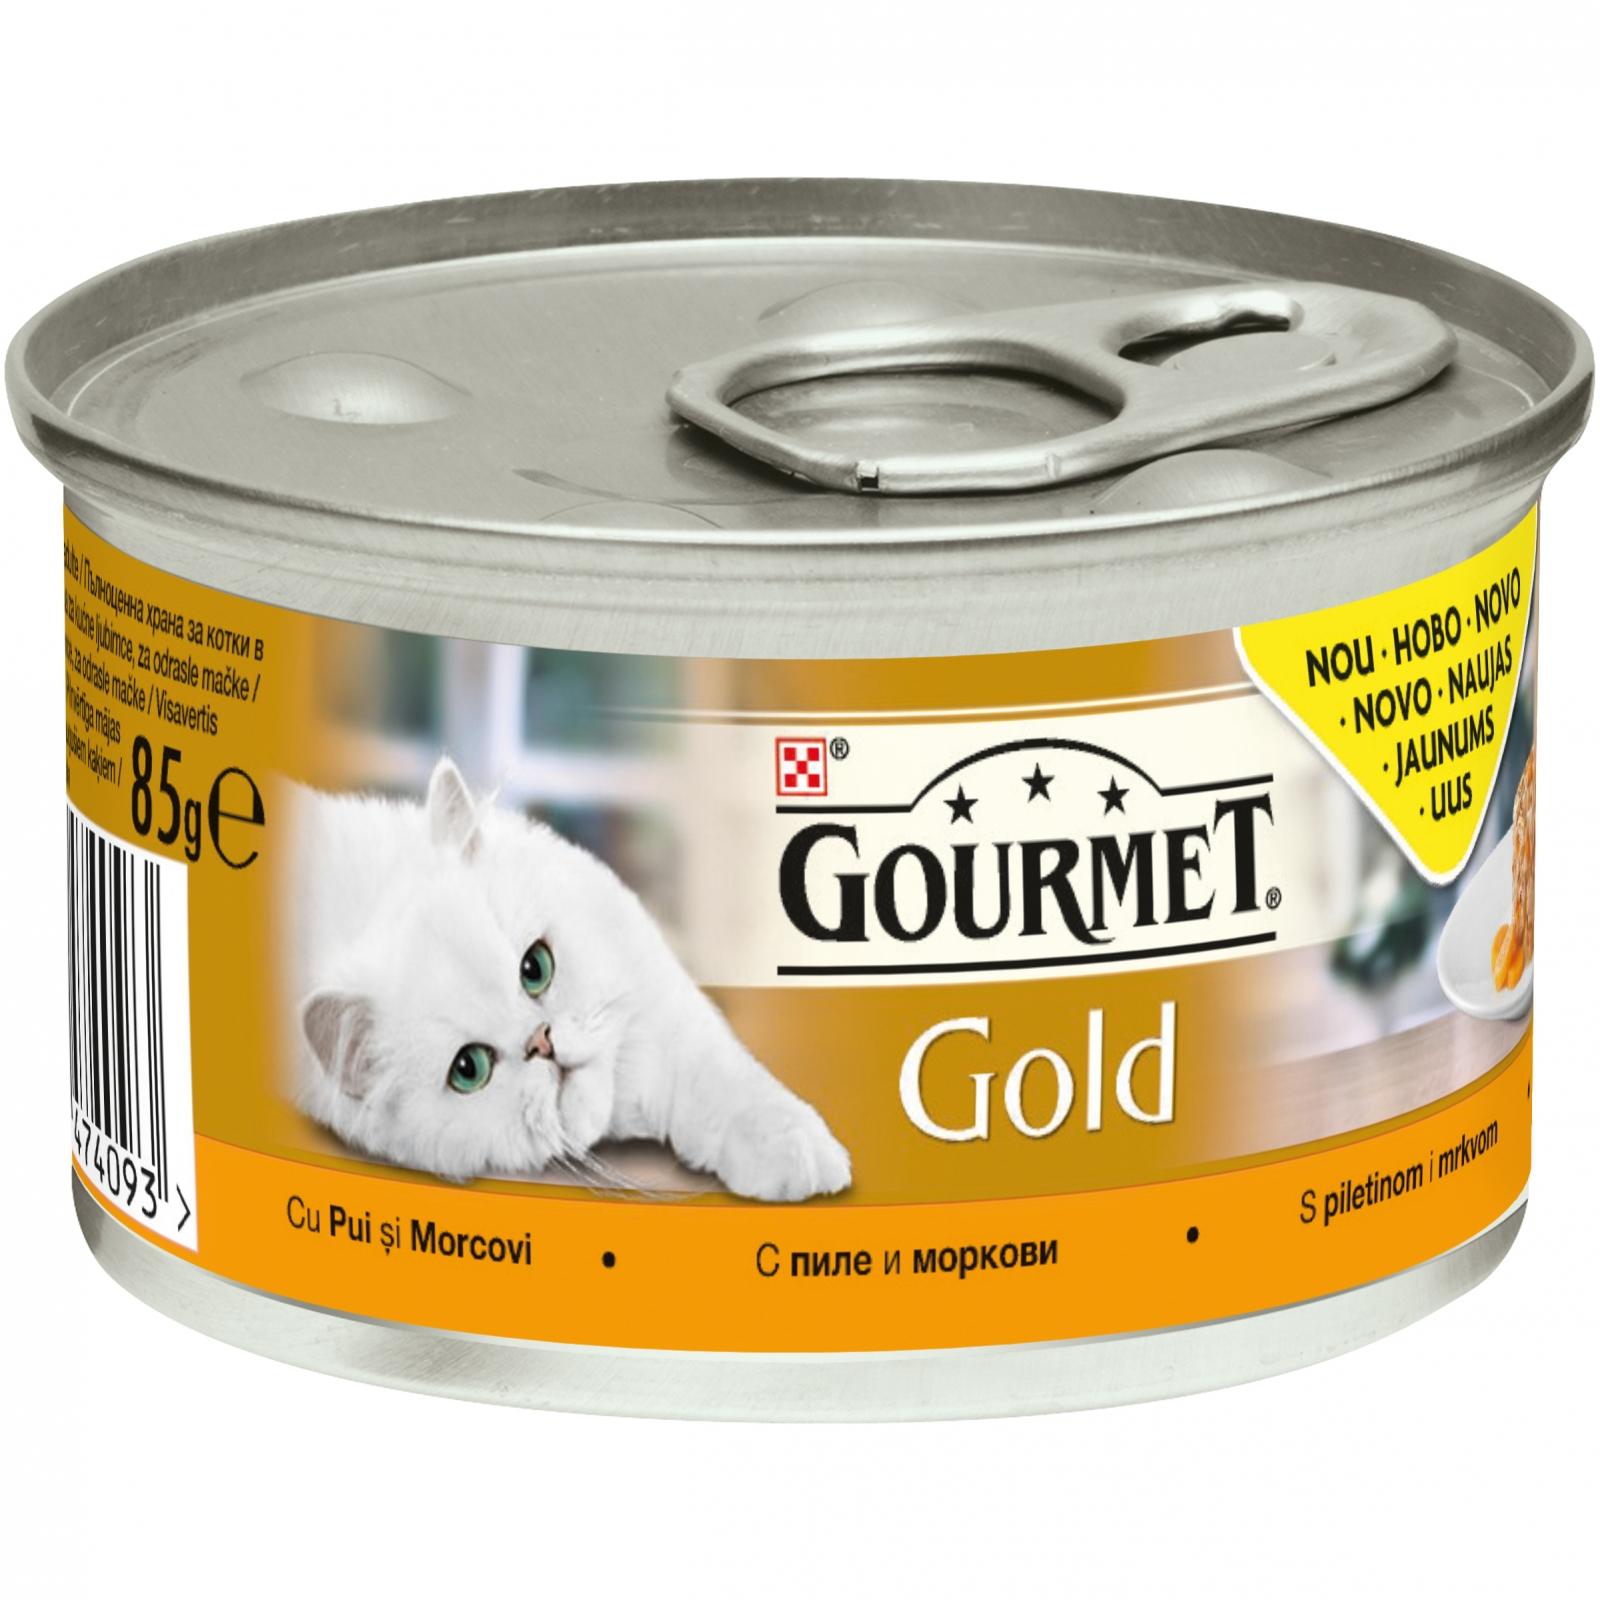 Gourmet Gold Savoury Cake cu Pui si Morcovi, 85 g